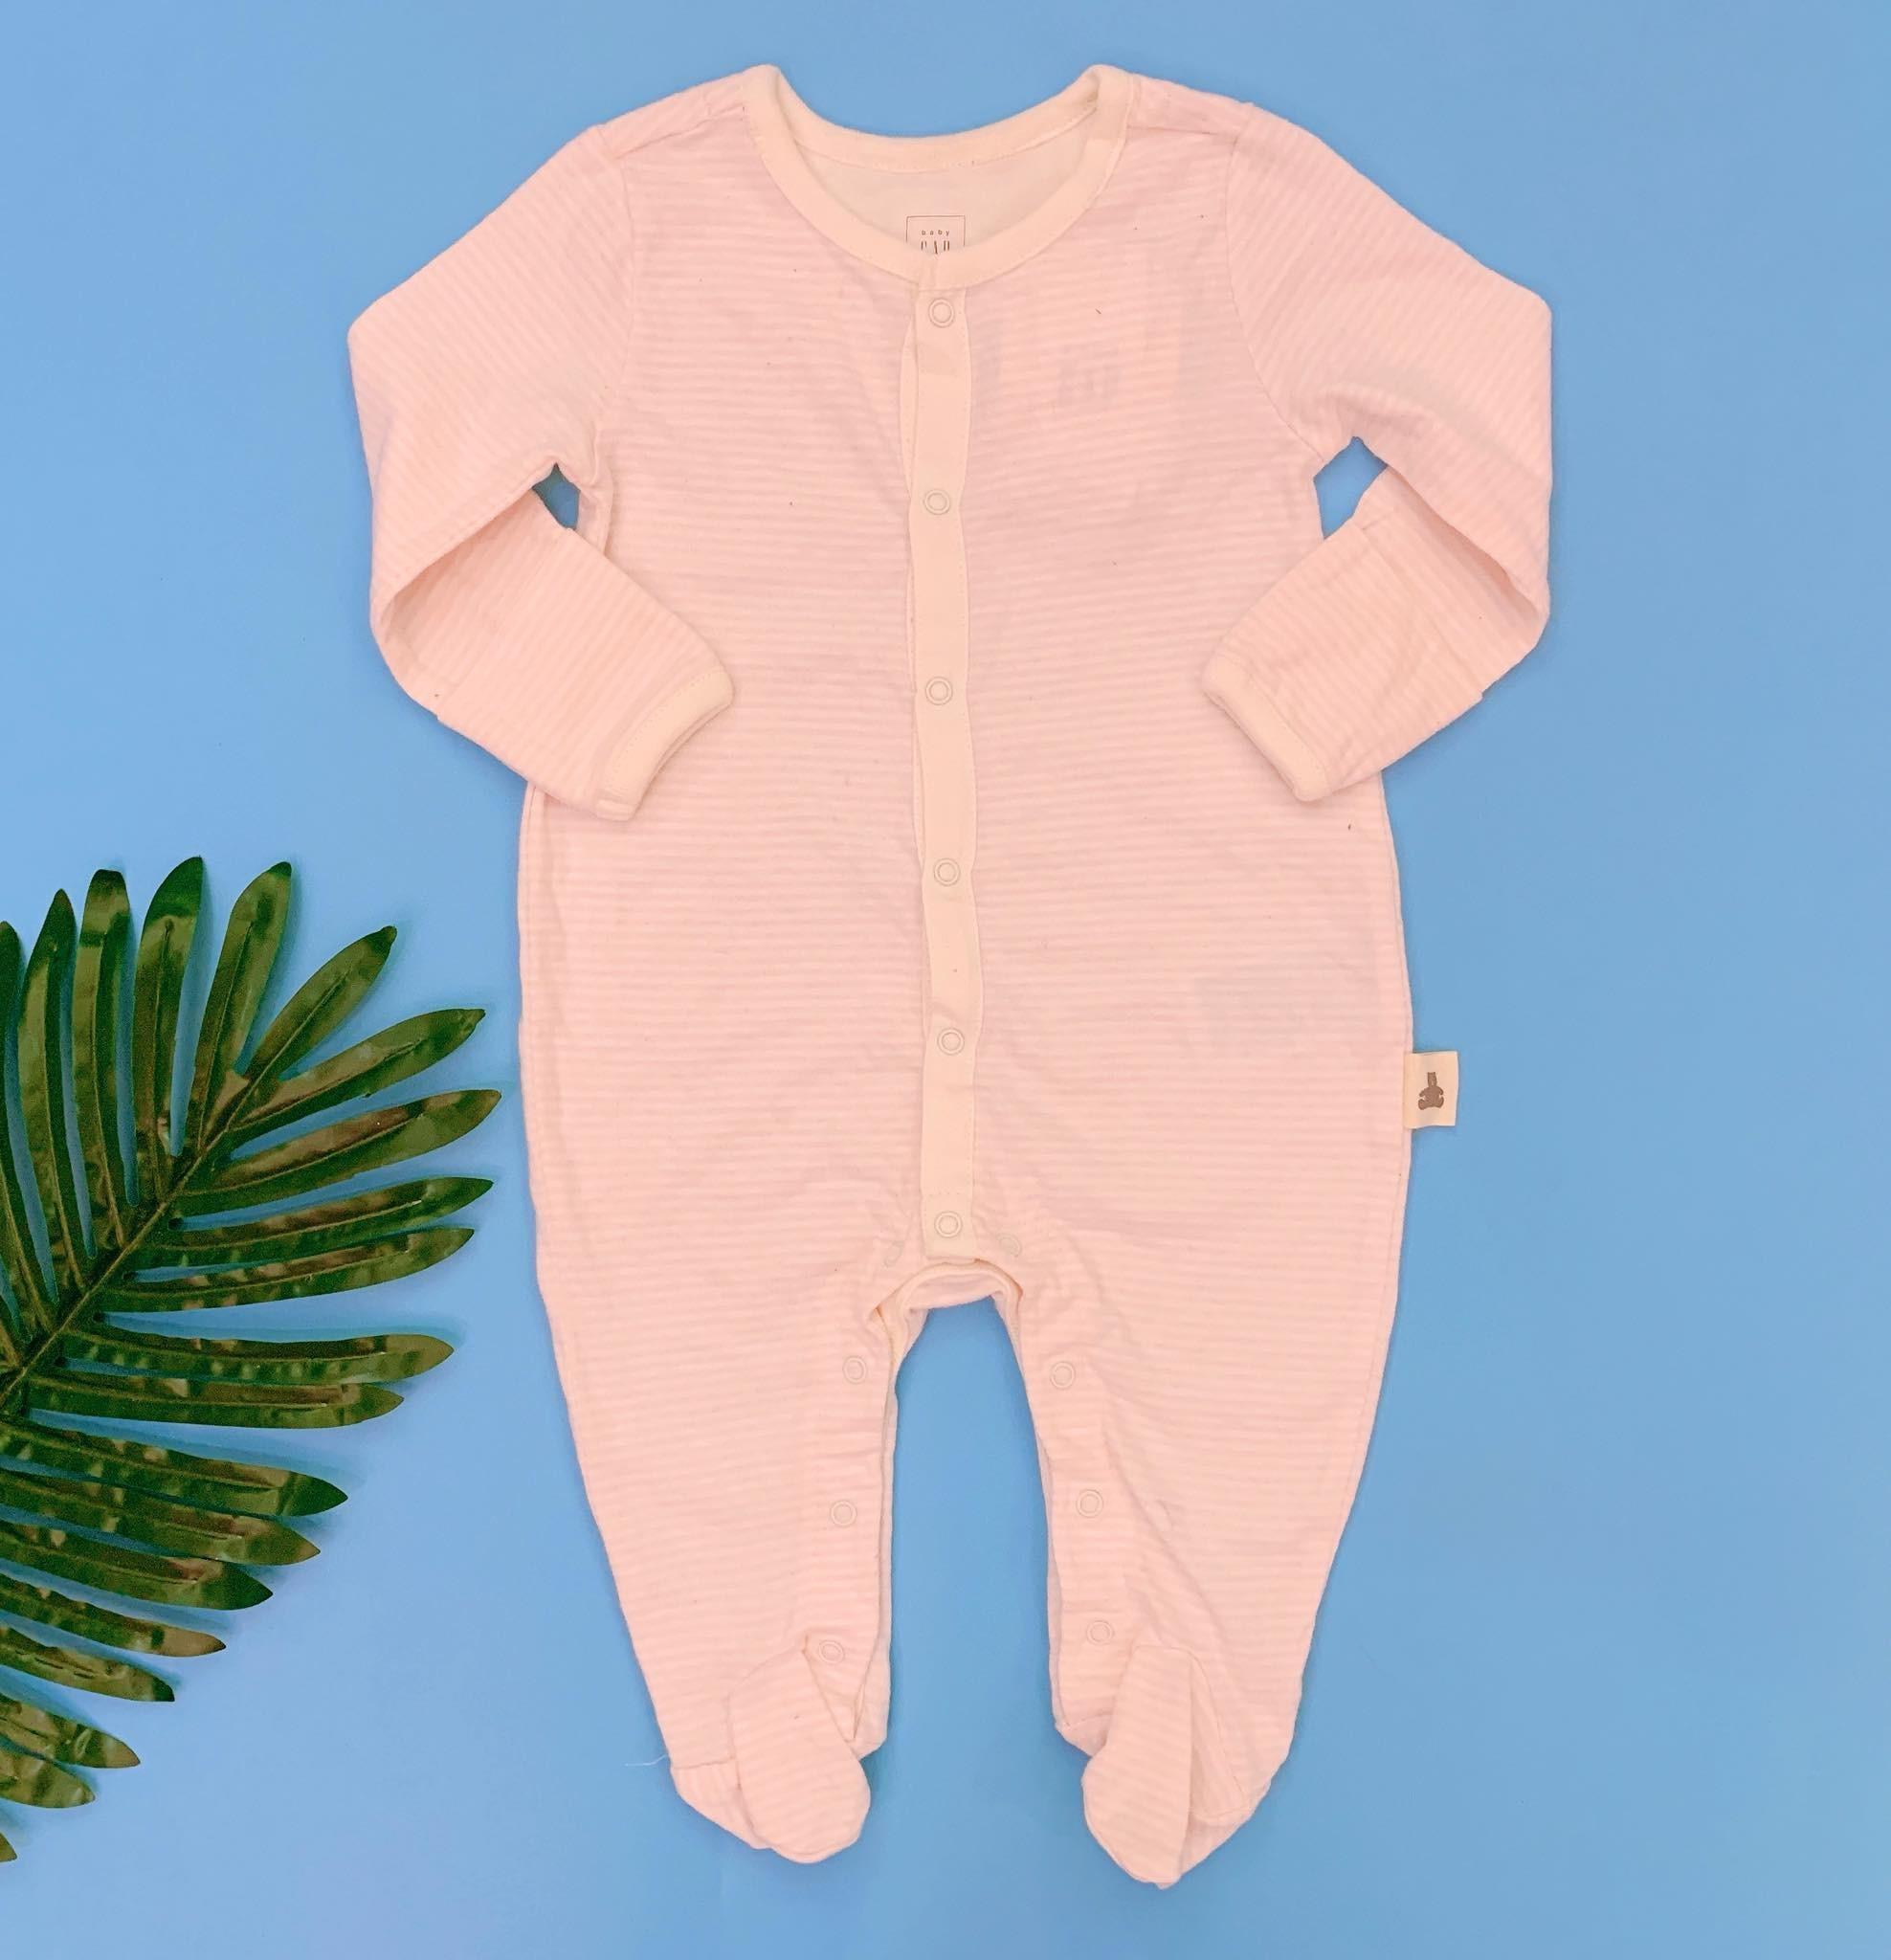 [5-10kg] Sleepsuit Baby Gap 56 [Girl] - Kem/Sọc Hồng Nhạt